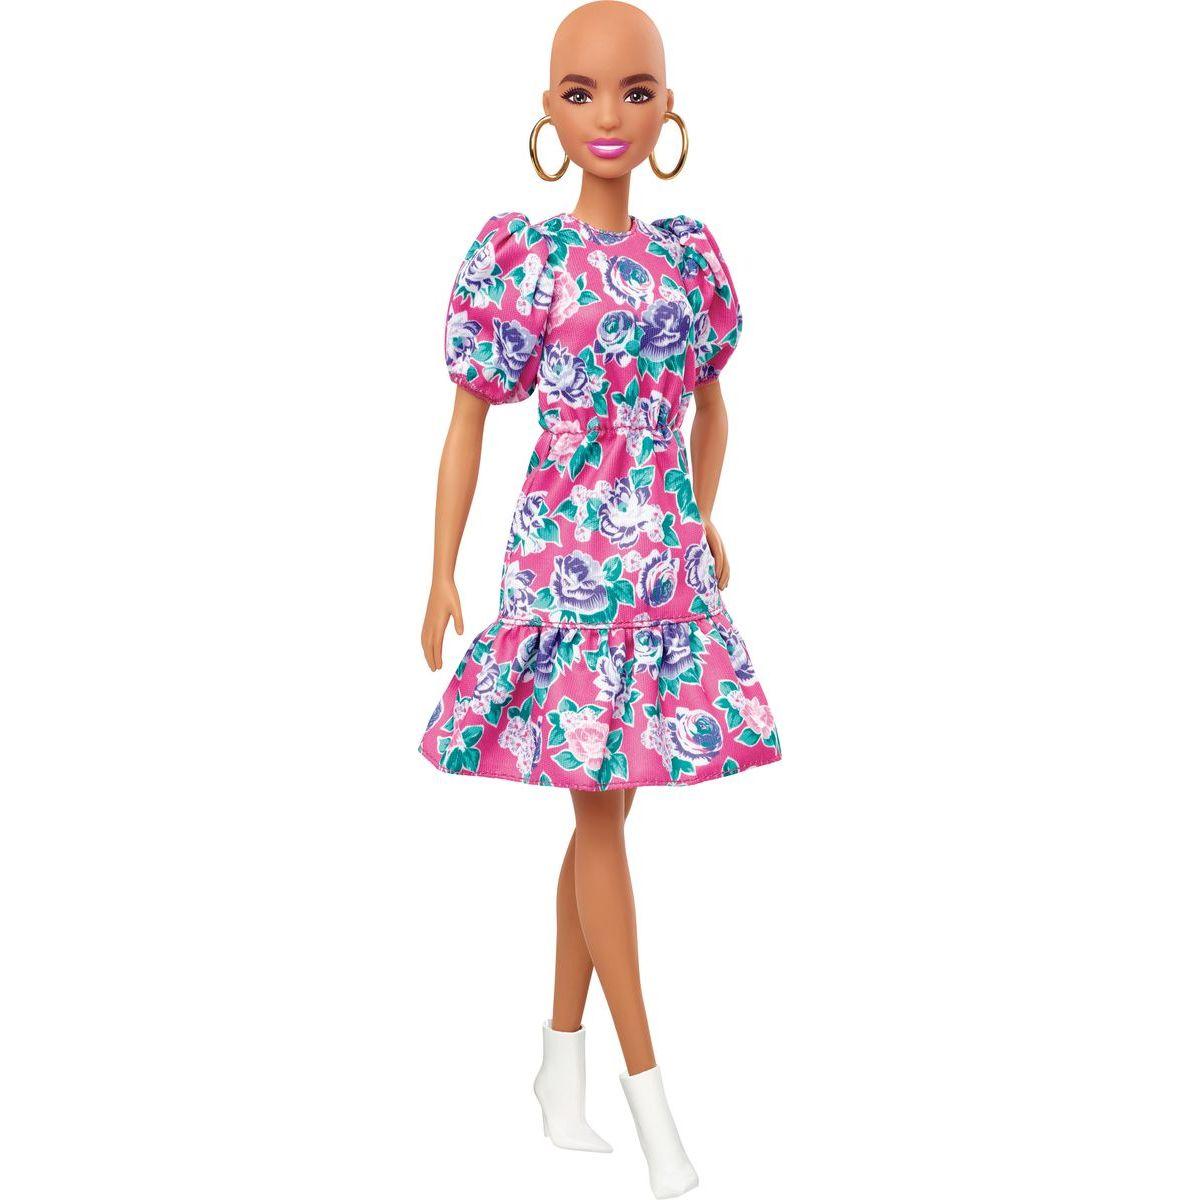 Mattel Barbie modelka panenka bez vlasů